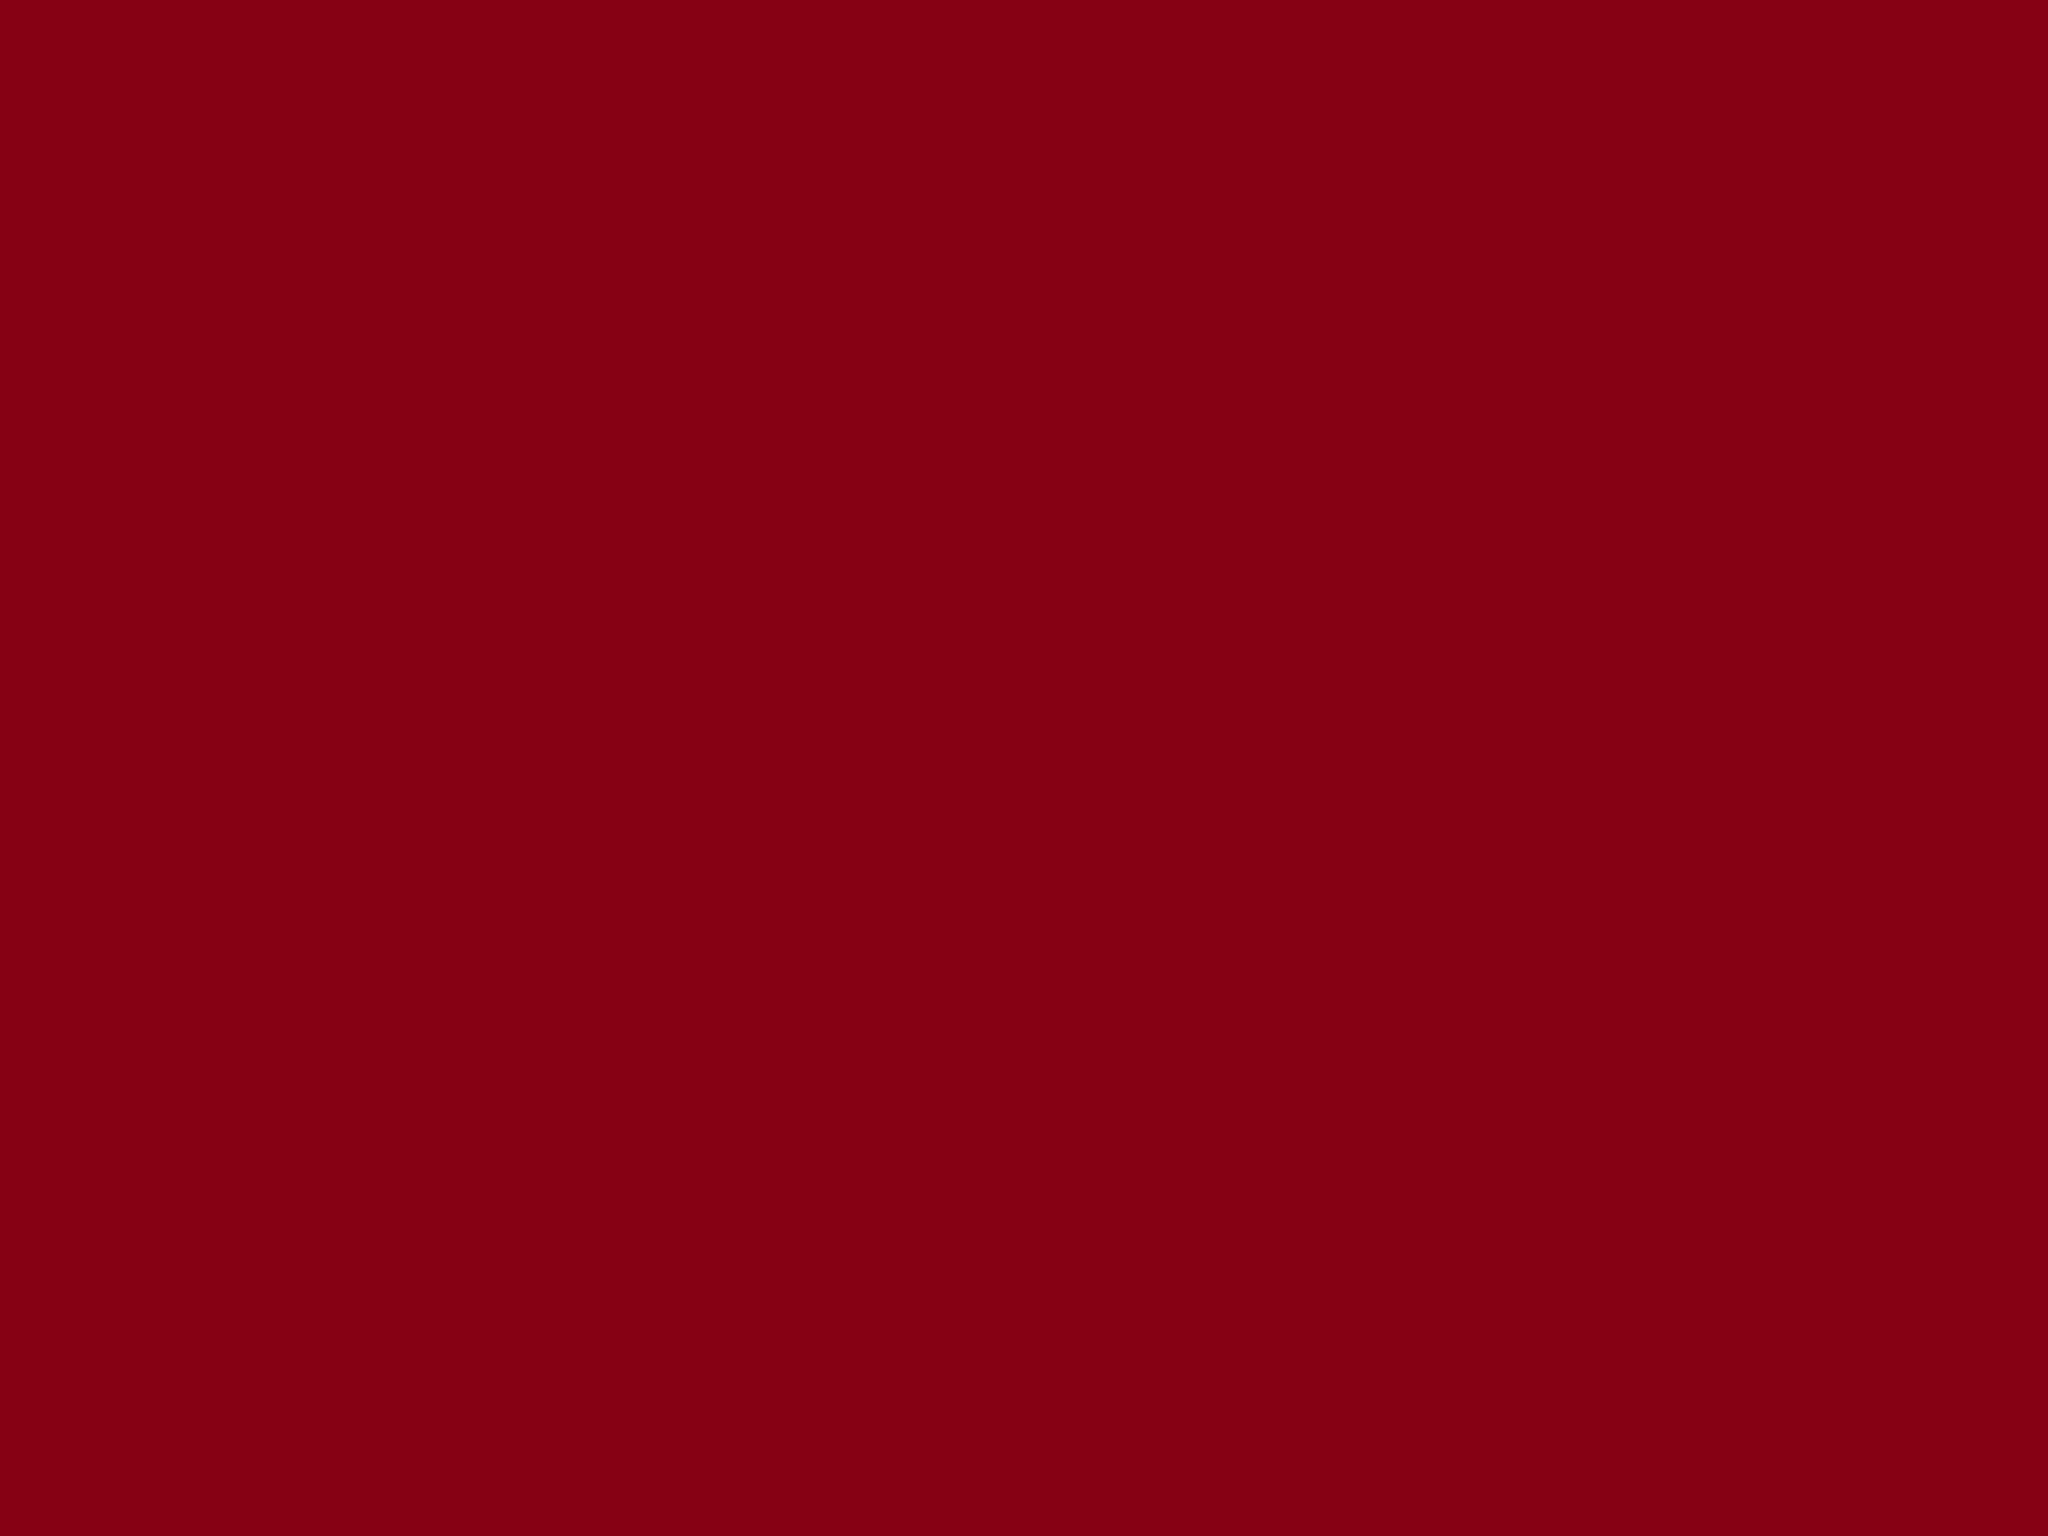 2048x1536 Red Devil Solid Color Background